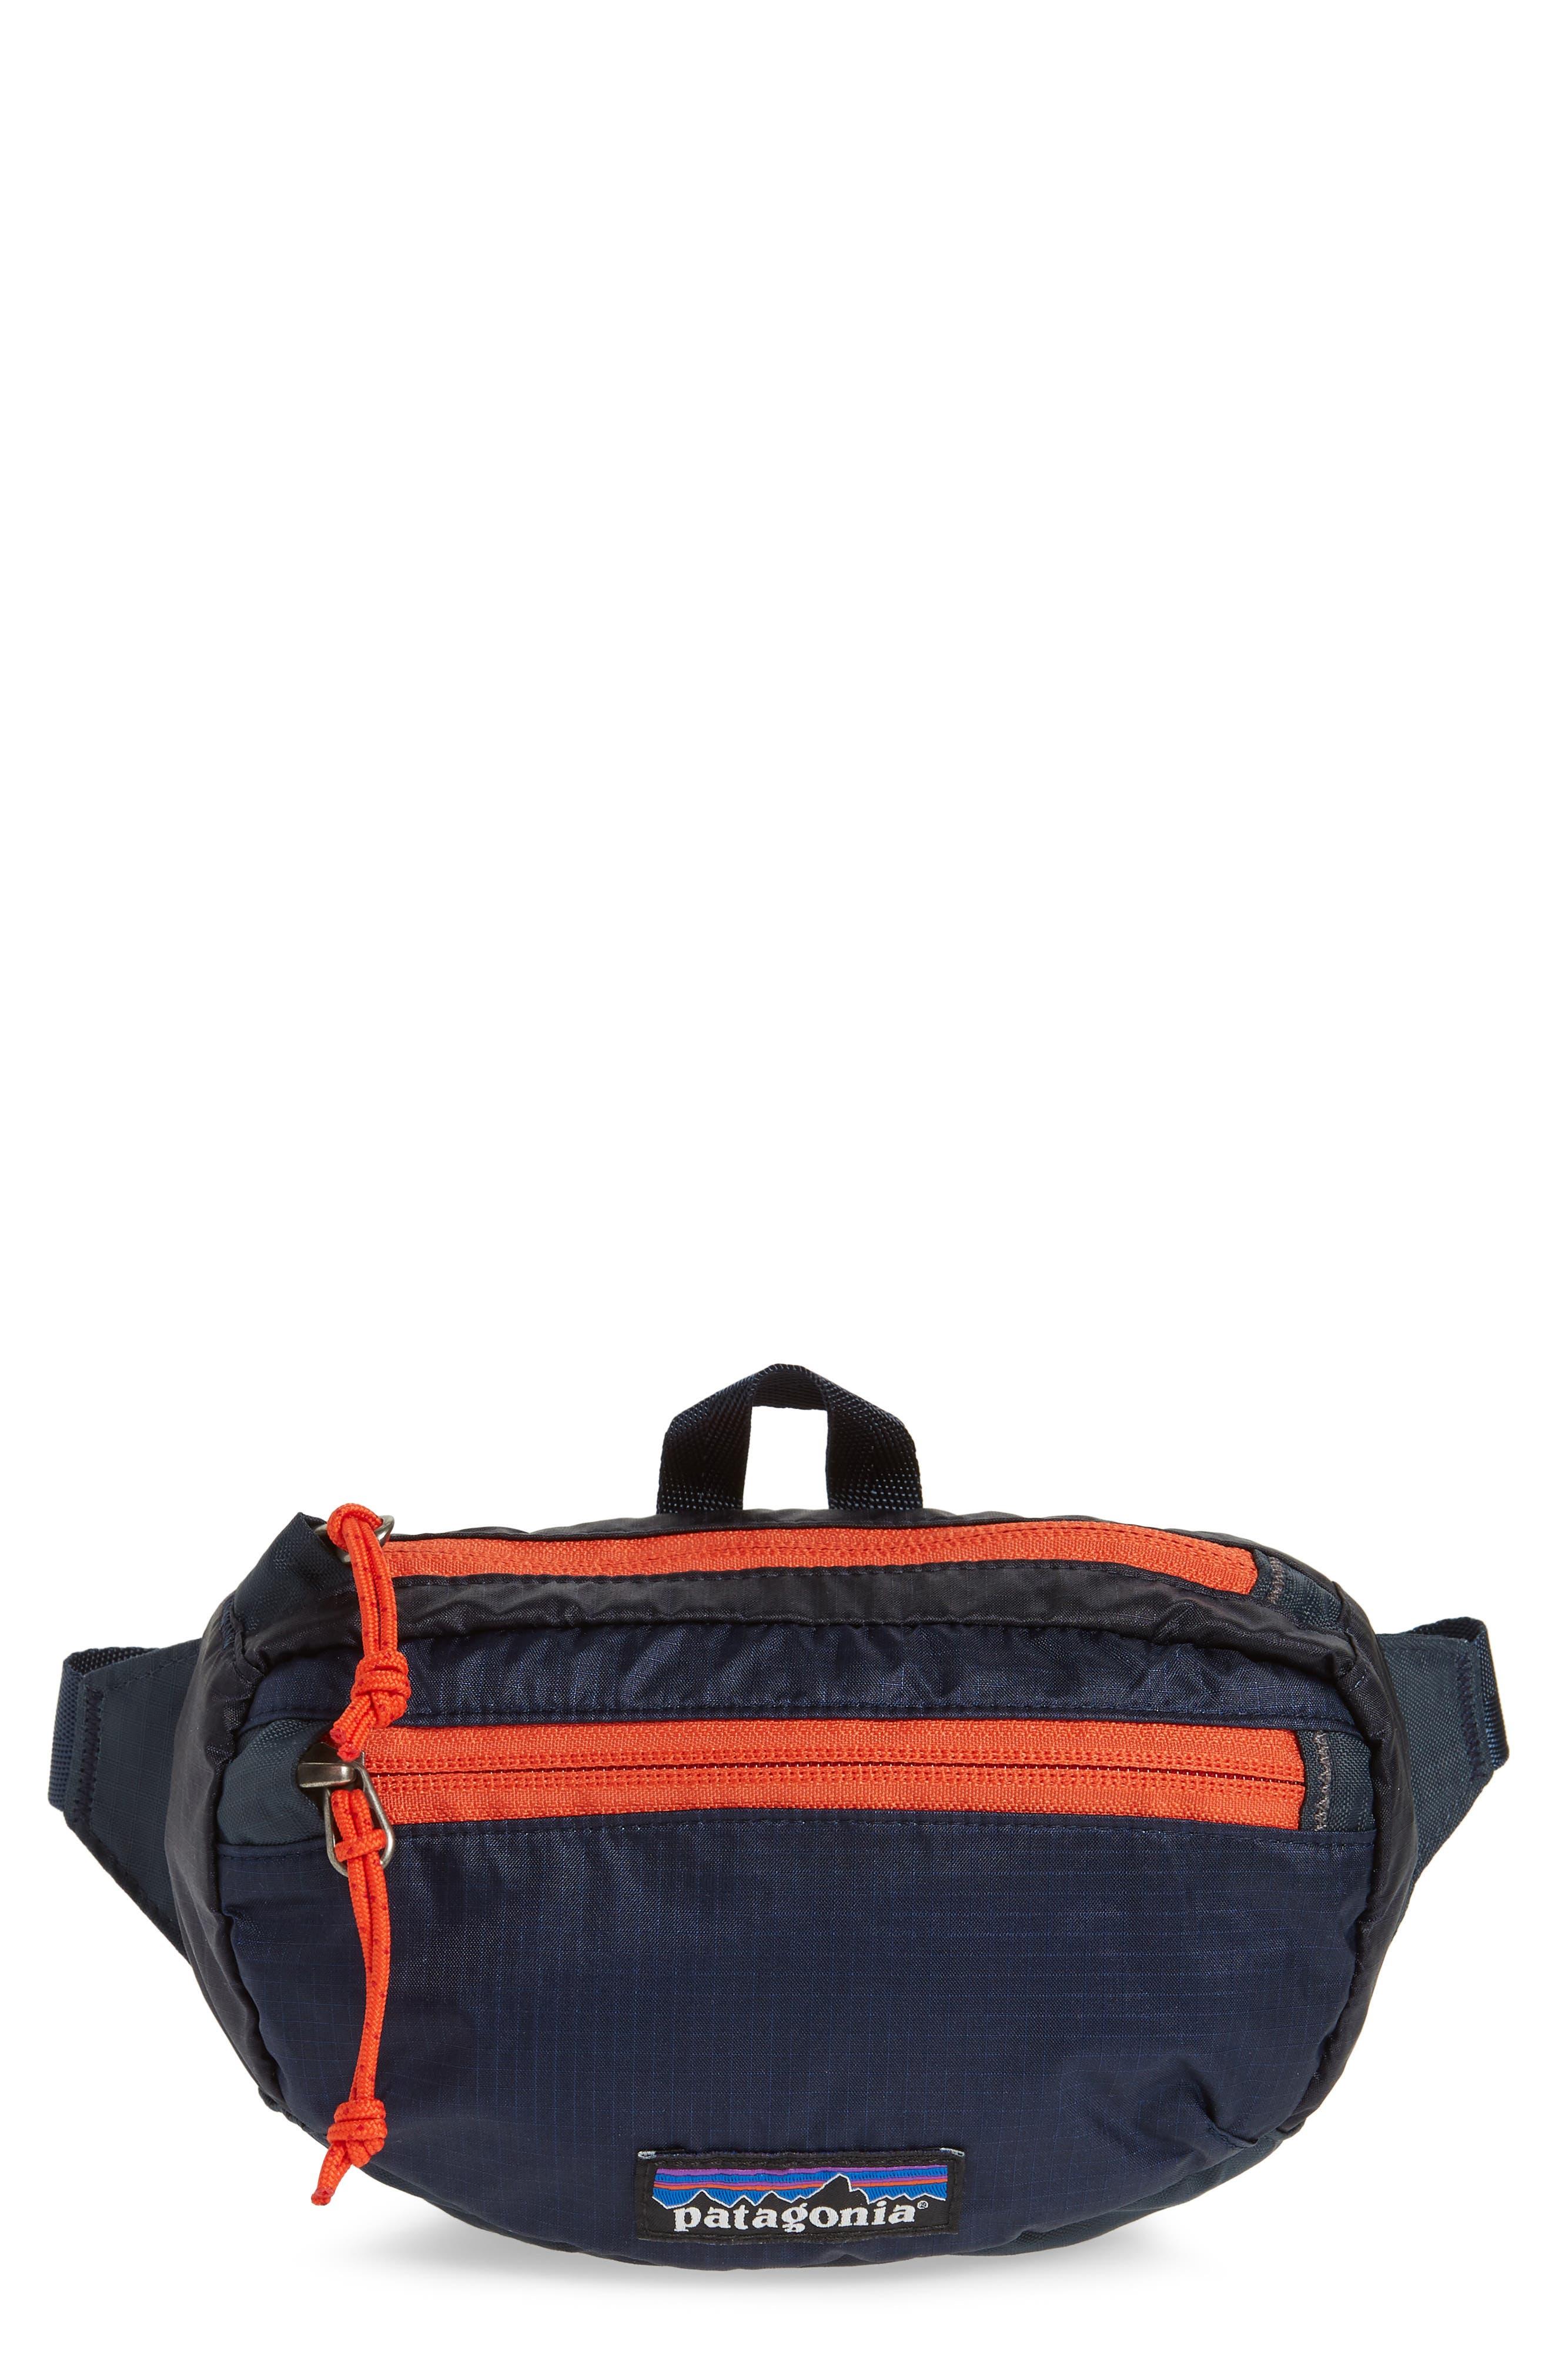 Travel Belt Bag,                             Main thumbnail 1, color,                             Smolder Blue